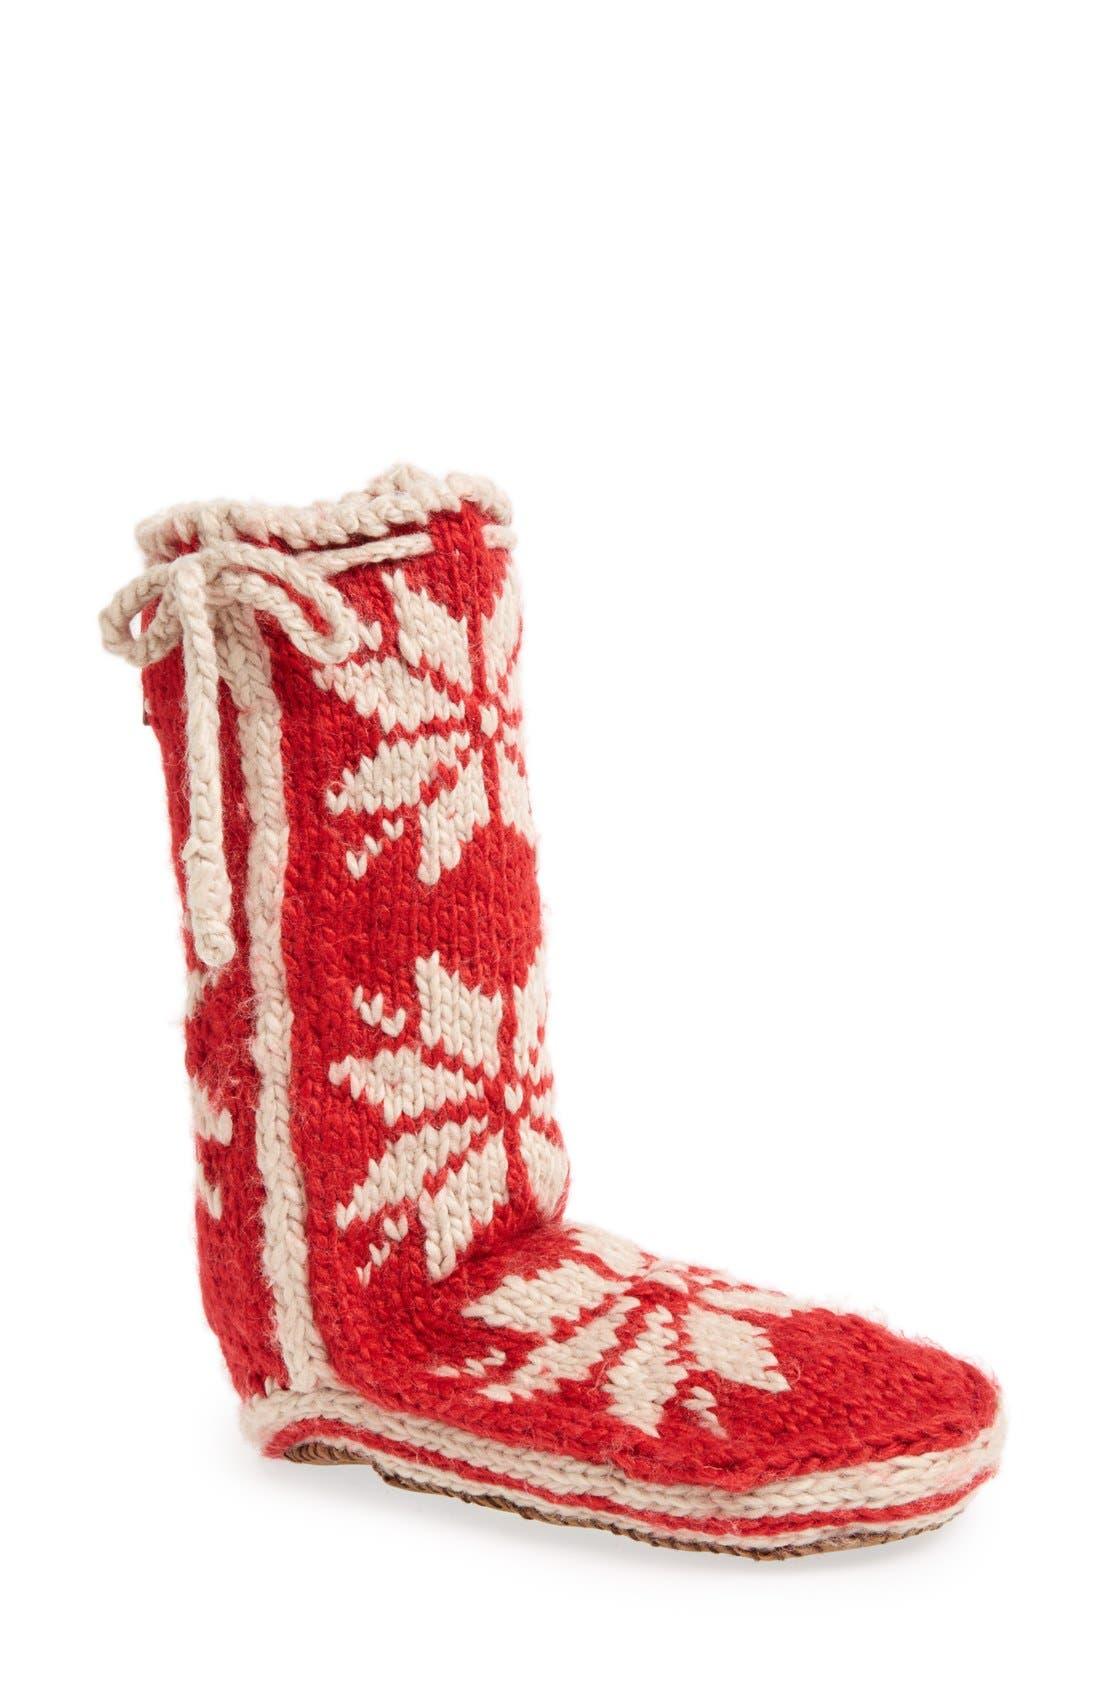 Alternate Image 1 Selected - Woolrich 'Chalet' Socks (Women)